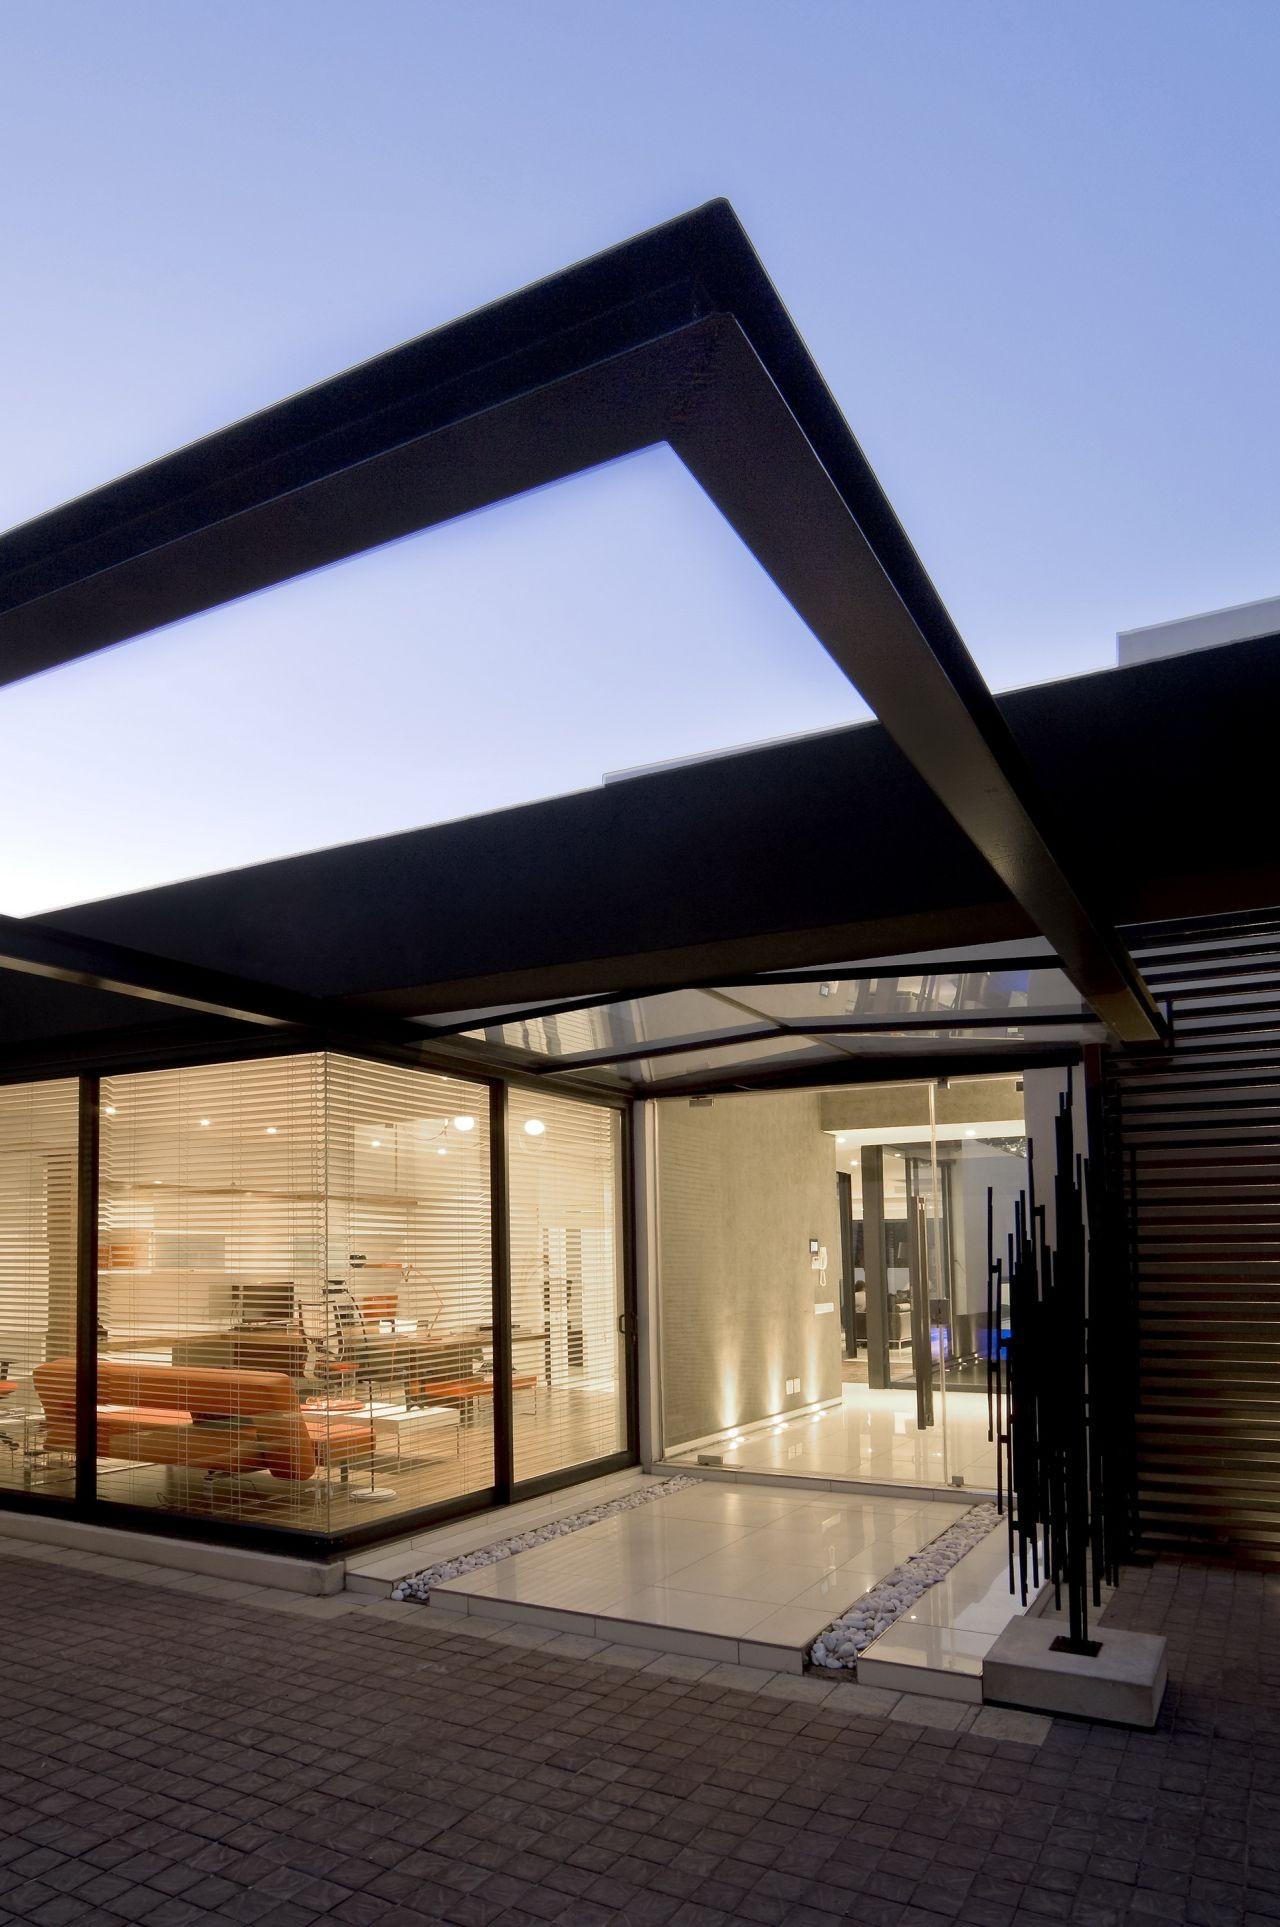 House Mosi / Nico van der Meulen Architects